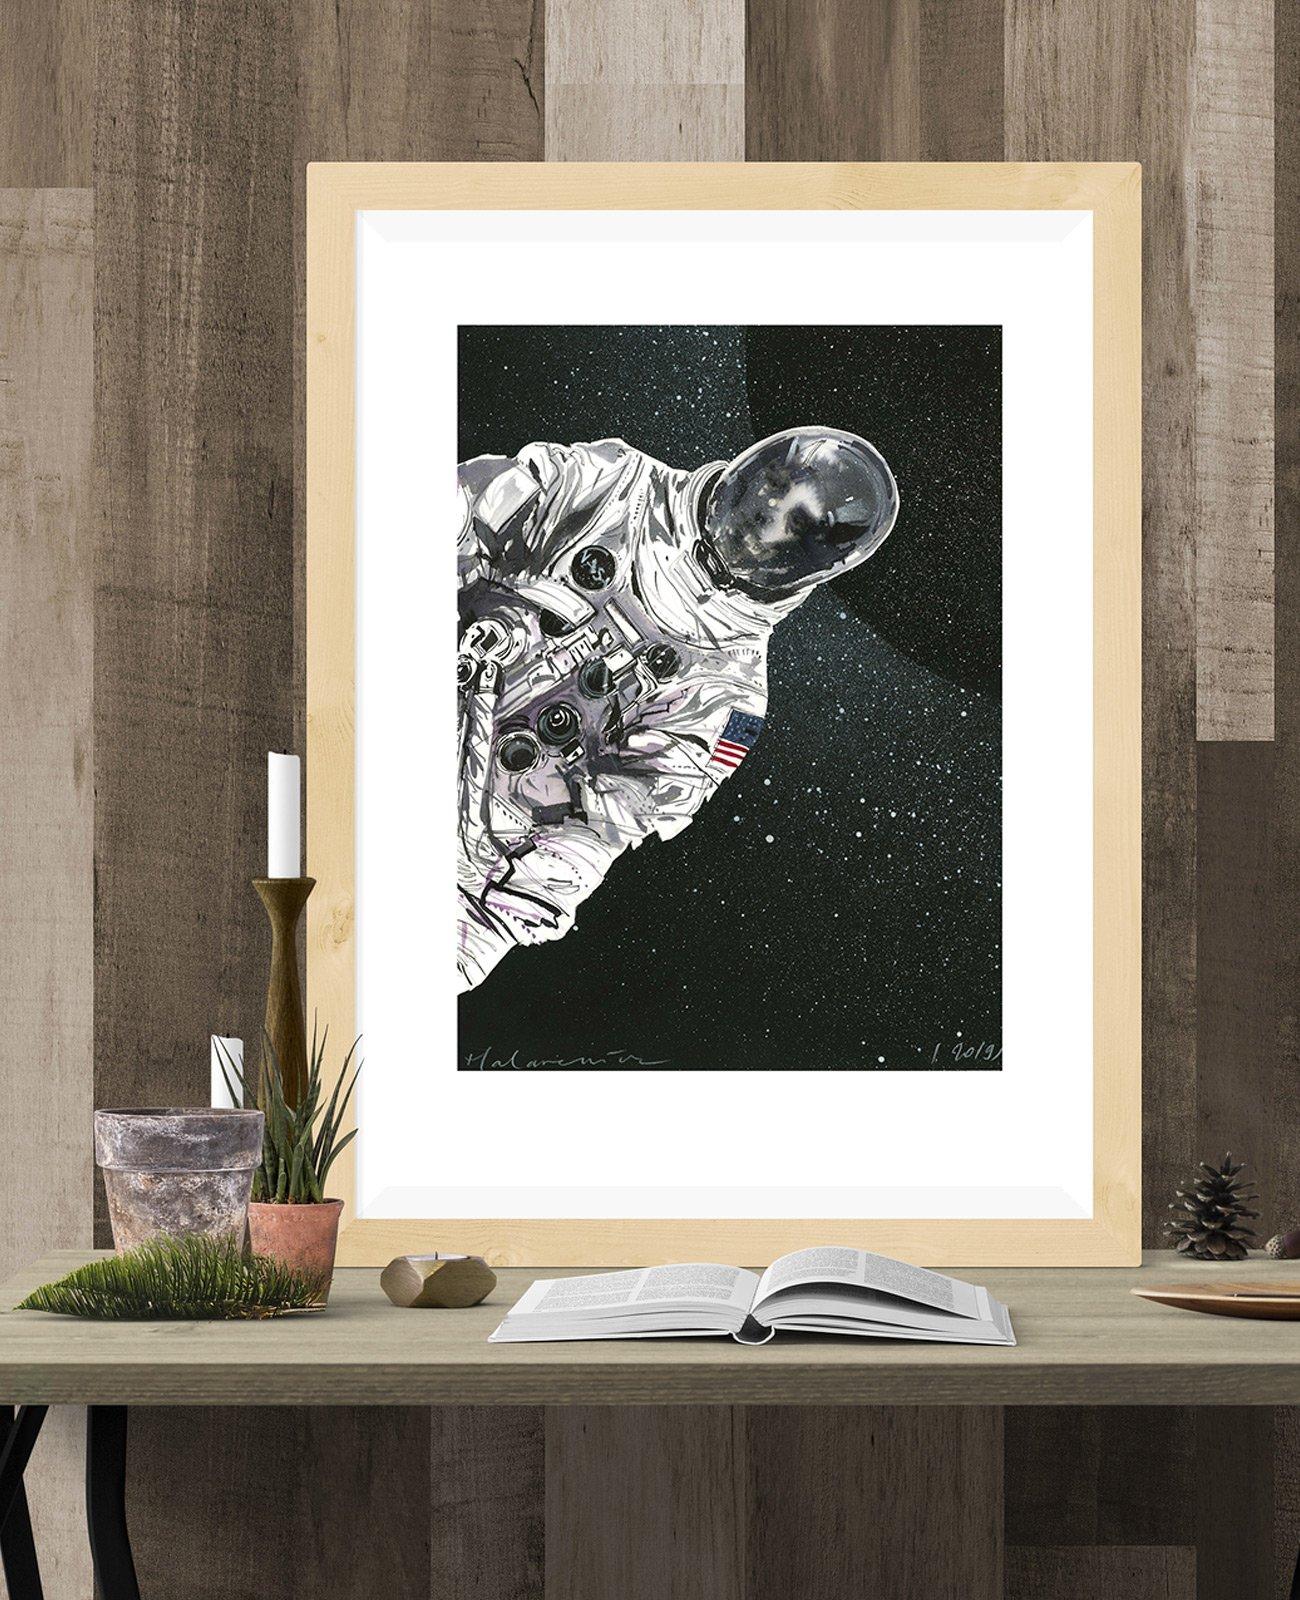 Astronaut 07